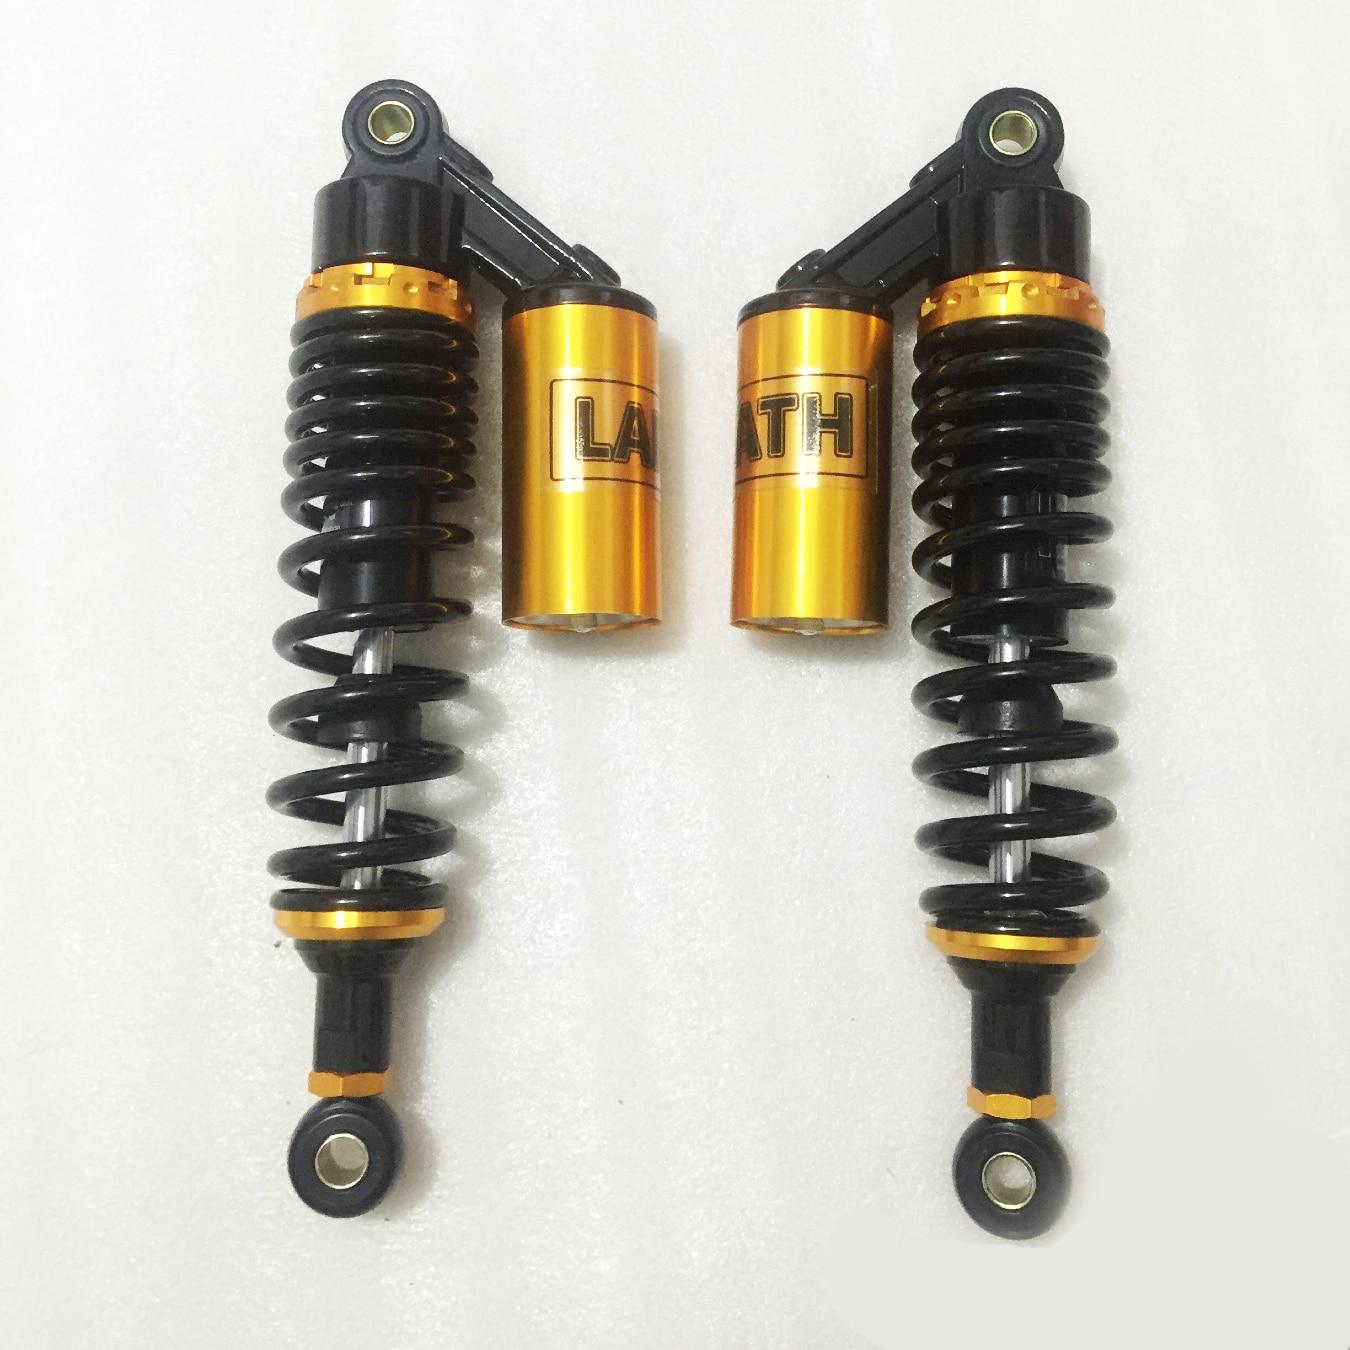 320mm 330mm 340mm Motorcycle Air Shock Absorber for HONDA SUZUKI YAMAHA cx500 xjr400 GSX750 CB400 TRX250R 450R 400ER